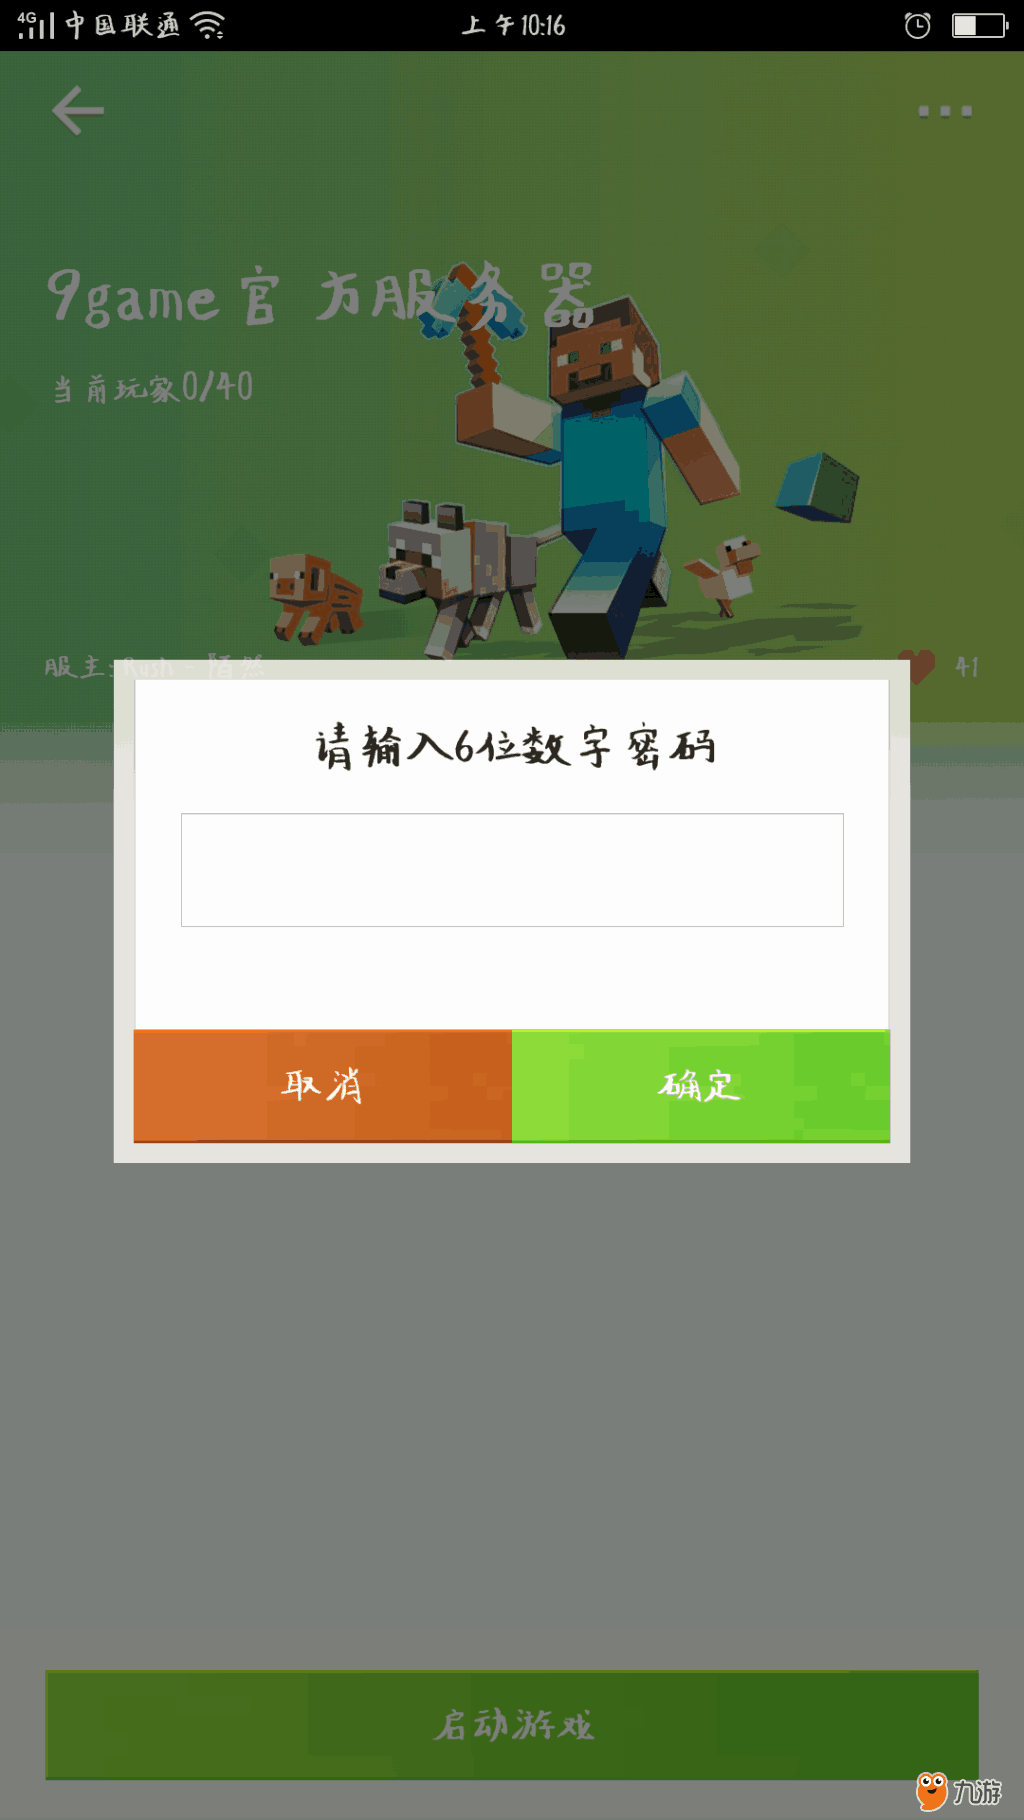 Screenshot_2018s10s07s10s16s55s40.png